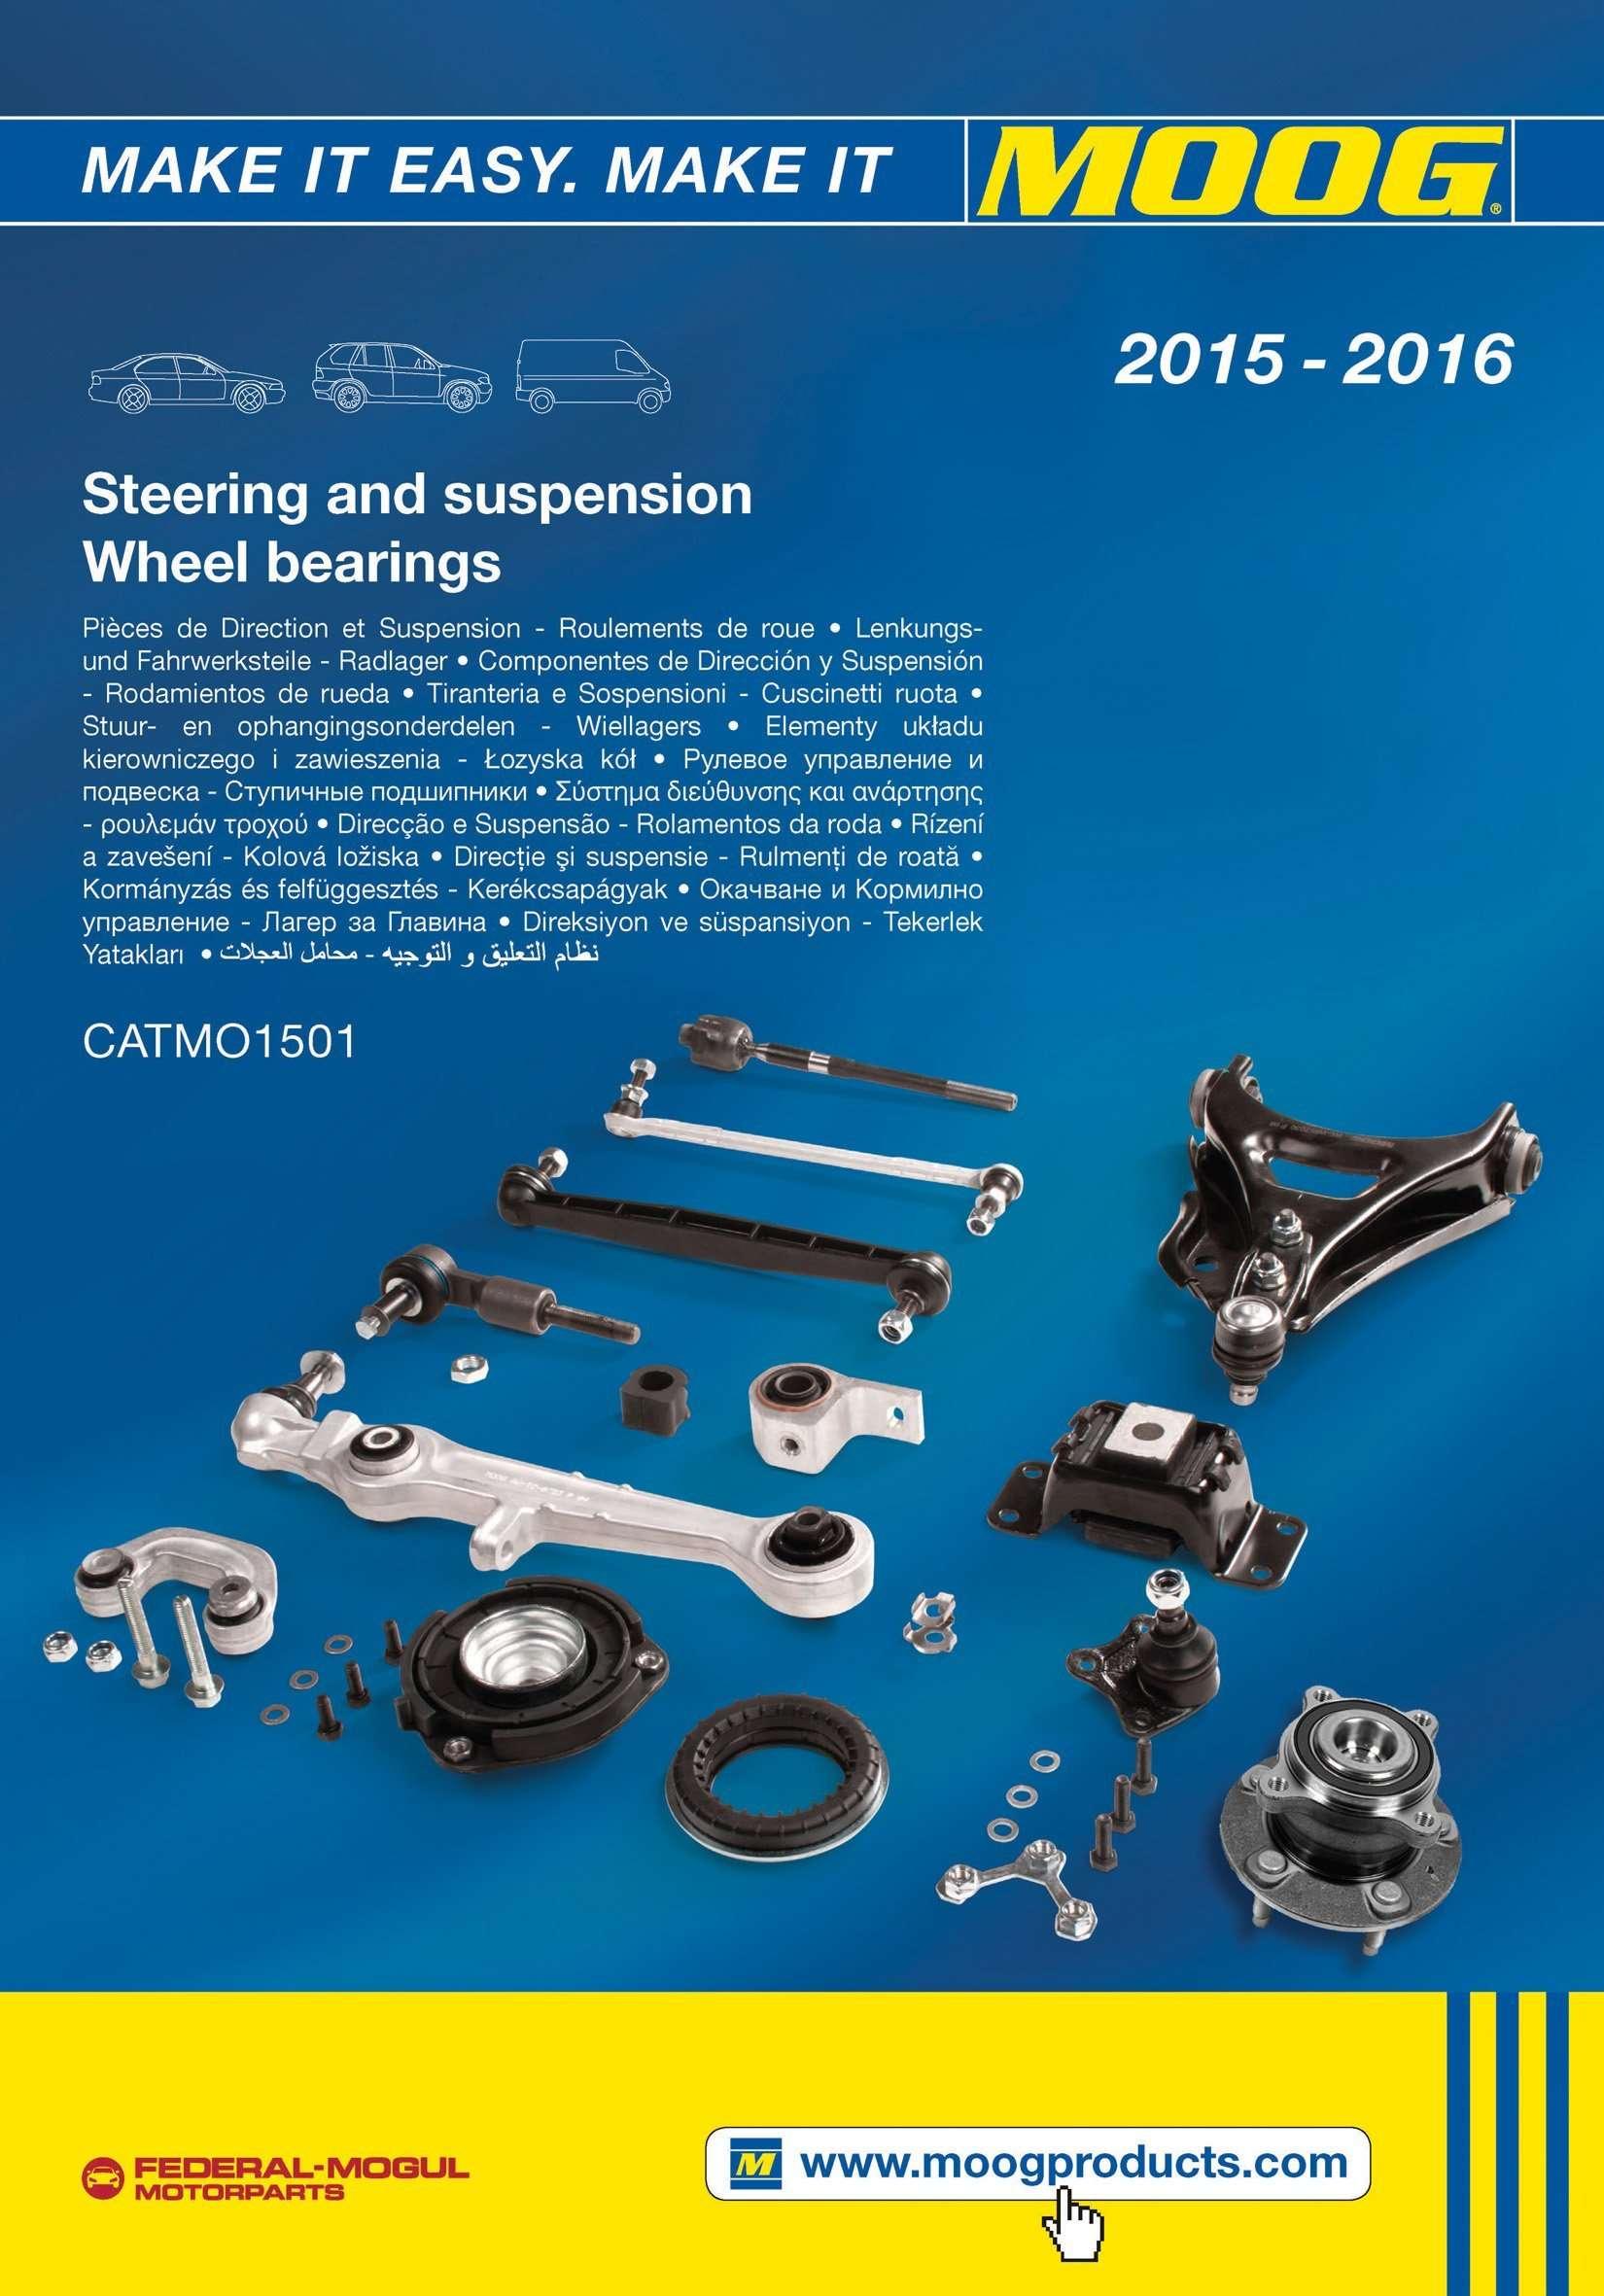 F-M Motorparts_Catalogo MOOG 2015-2016